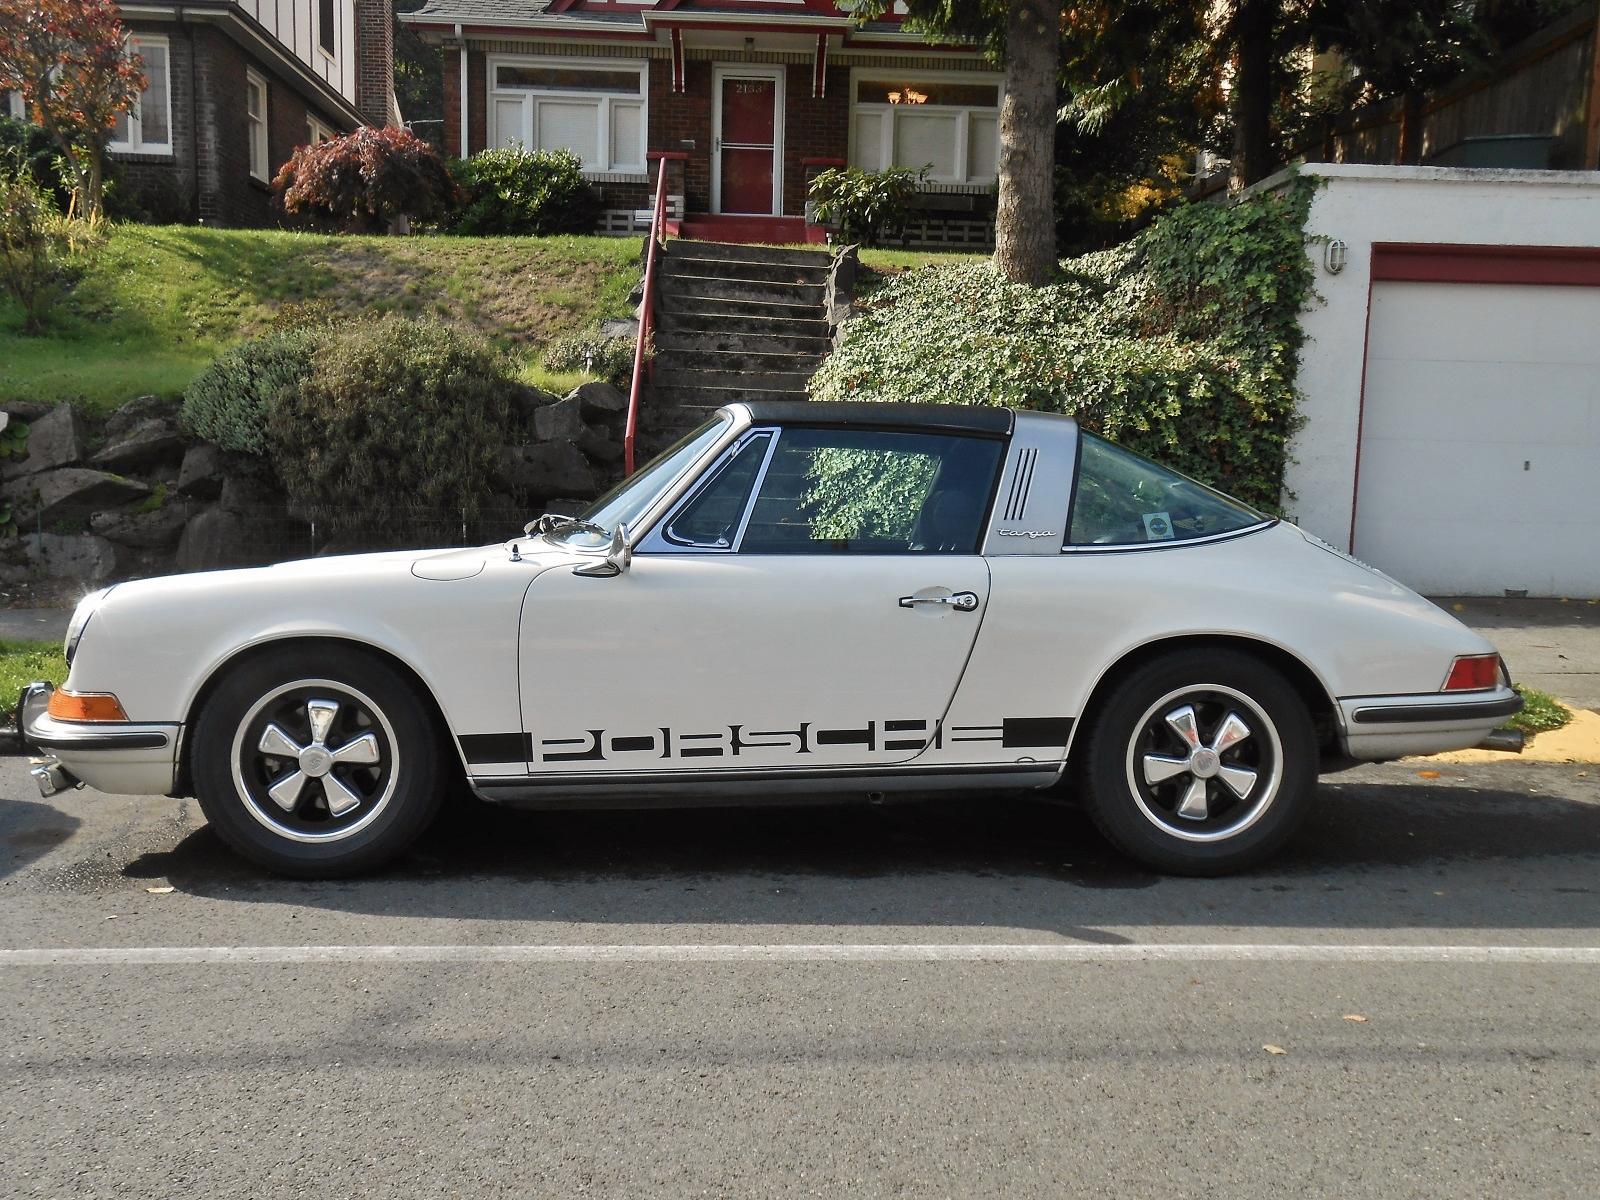 Seattle S Parked Cars 1970 Porsche 911e Targa